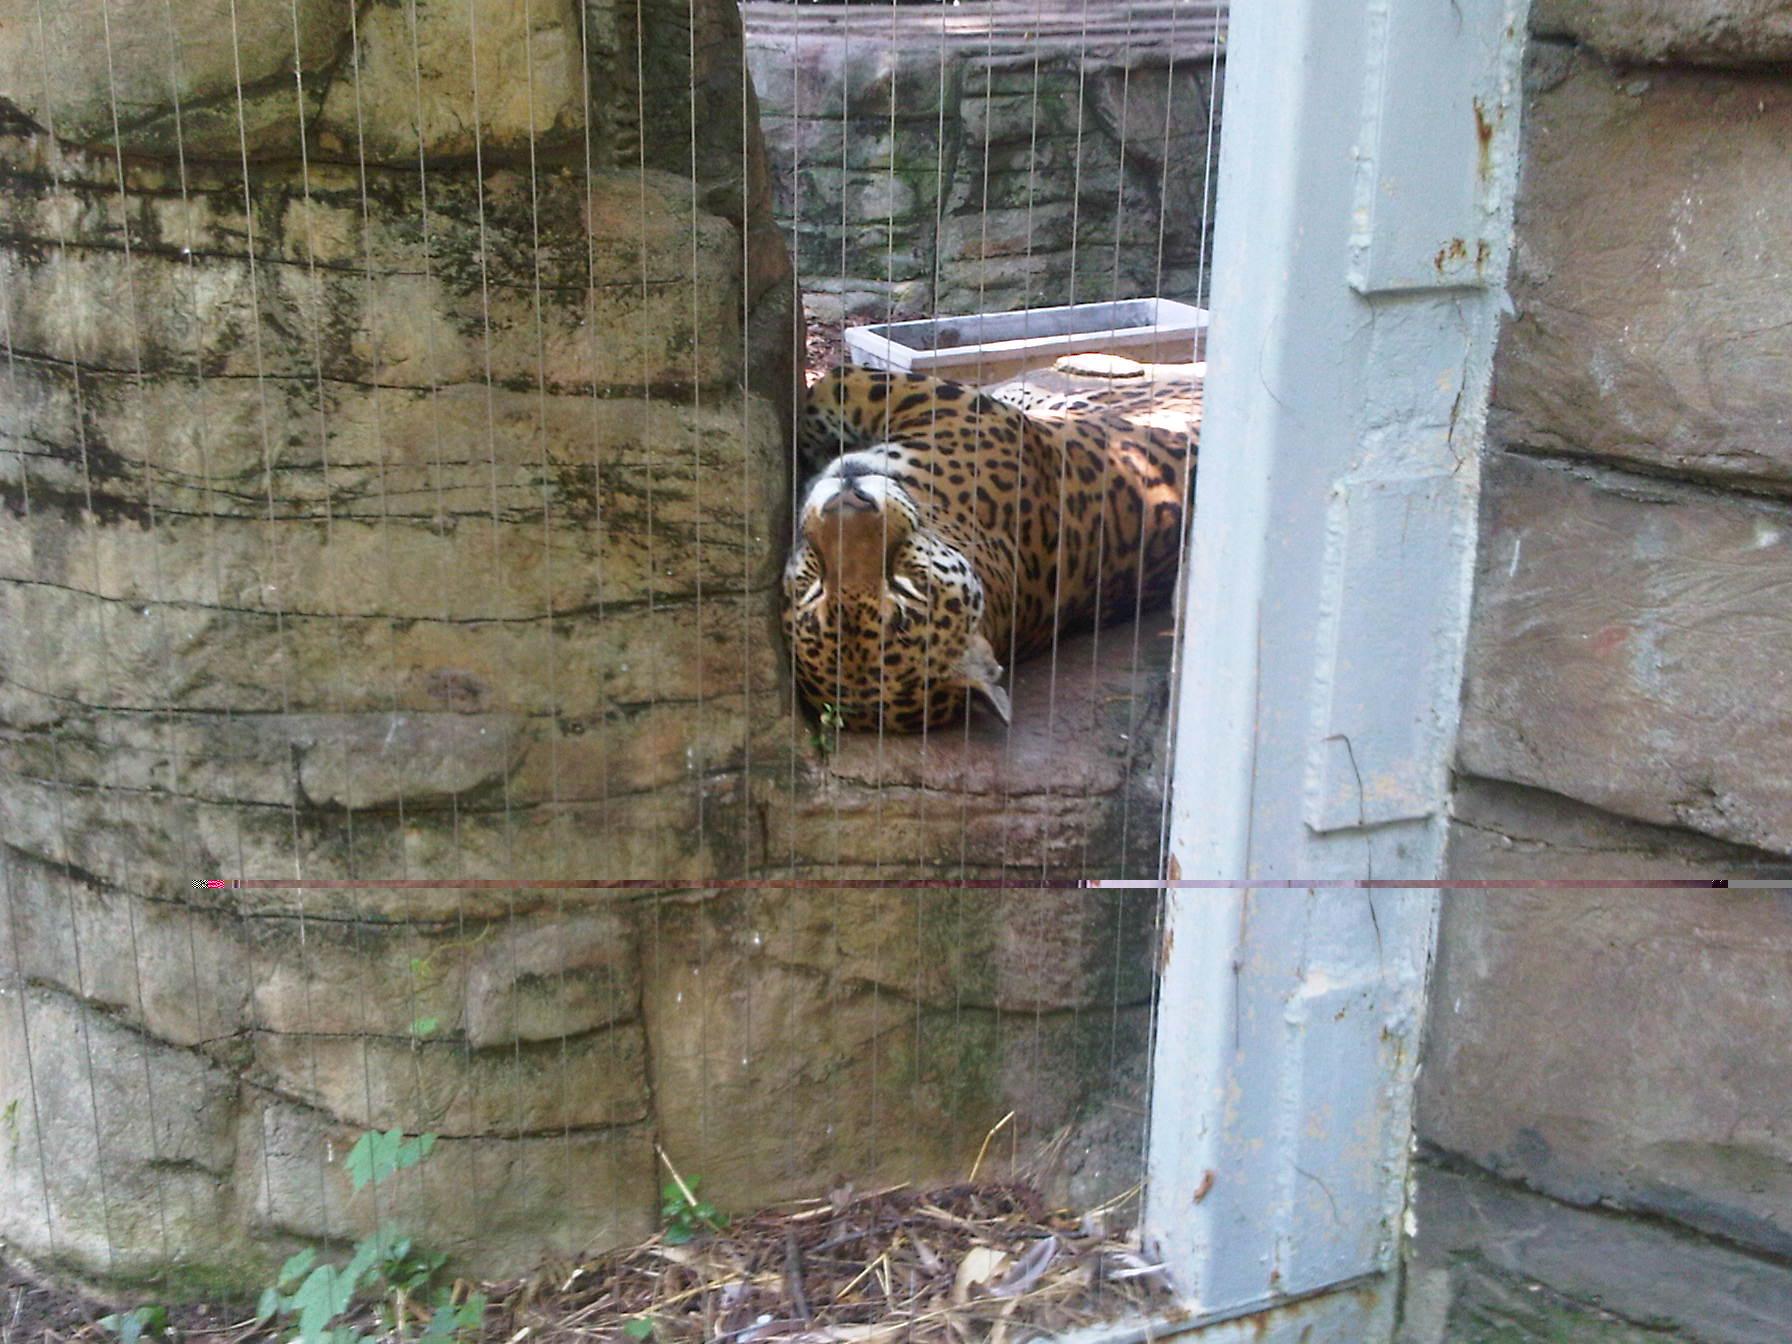 File:Jaguar At The Louisville Zoo